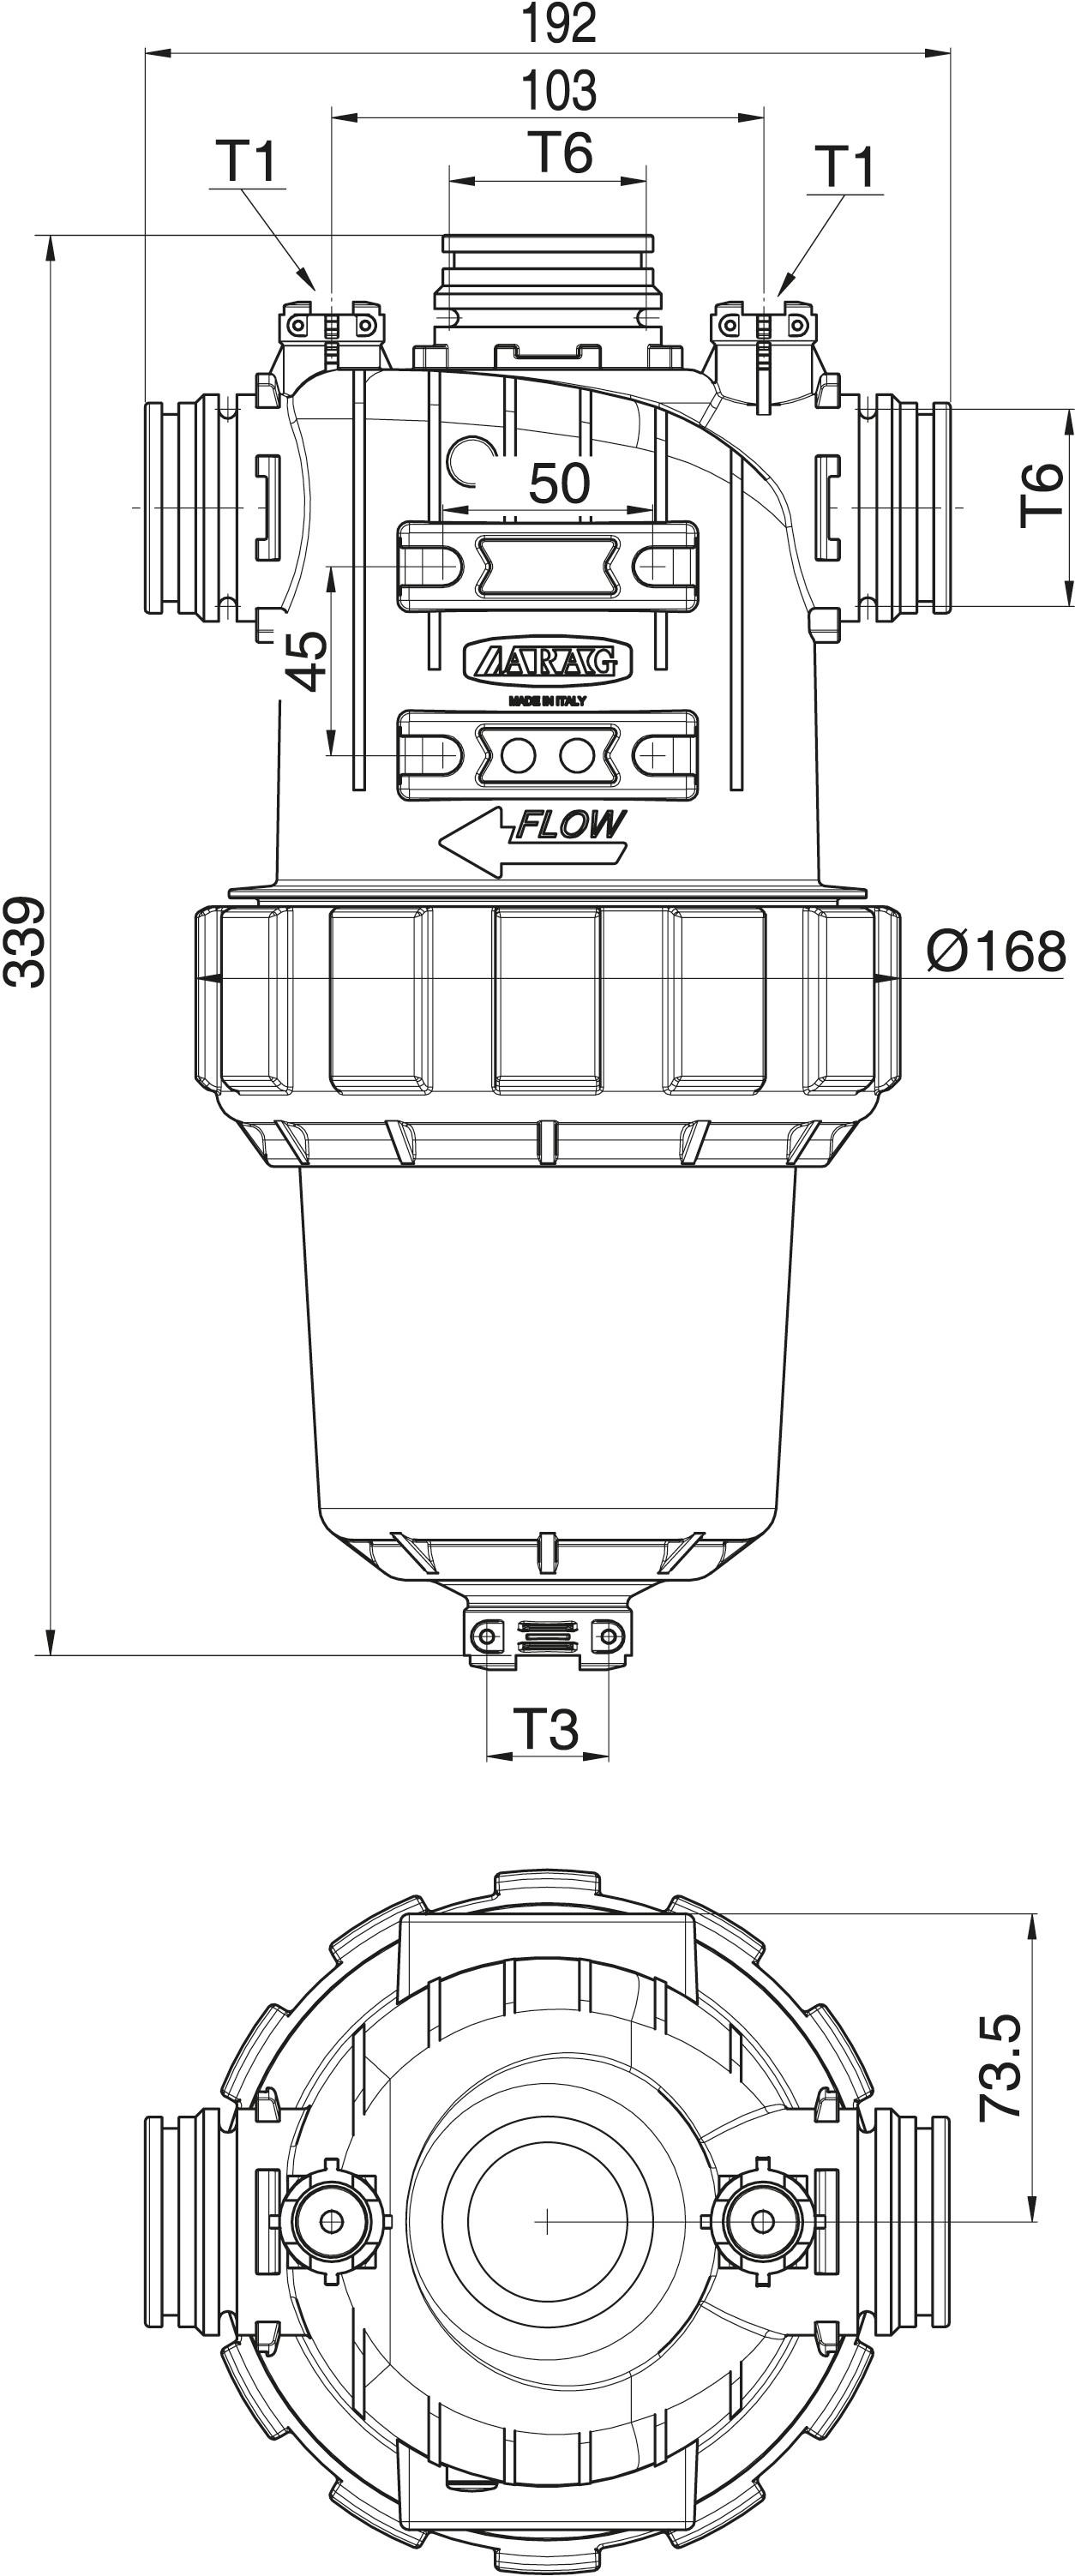 arag pressure filter 330 with intake on top buy here